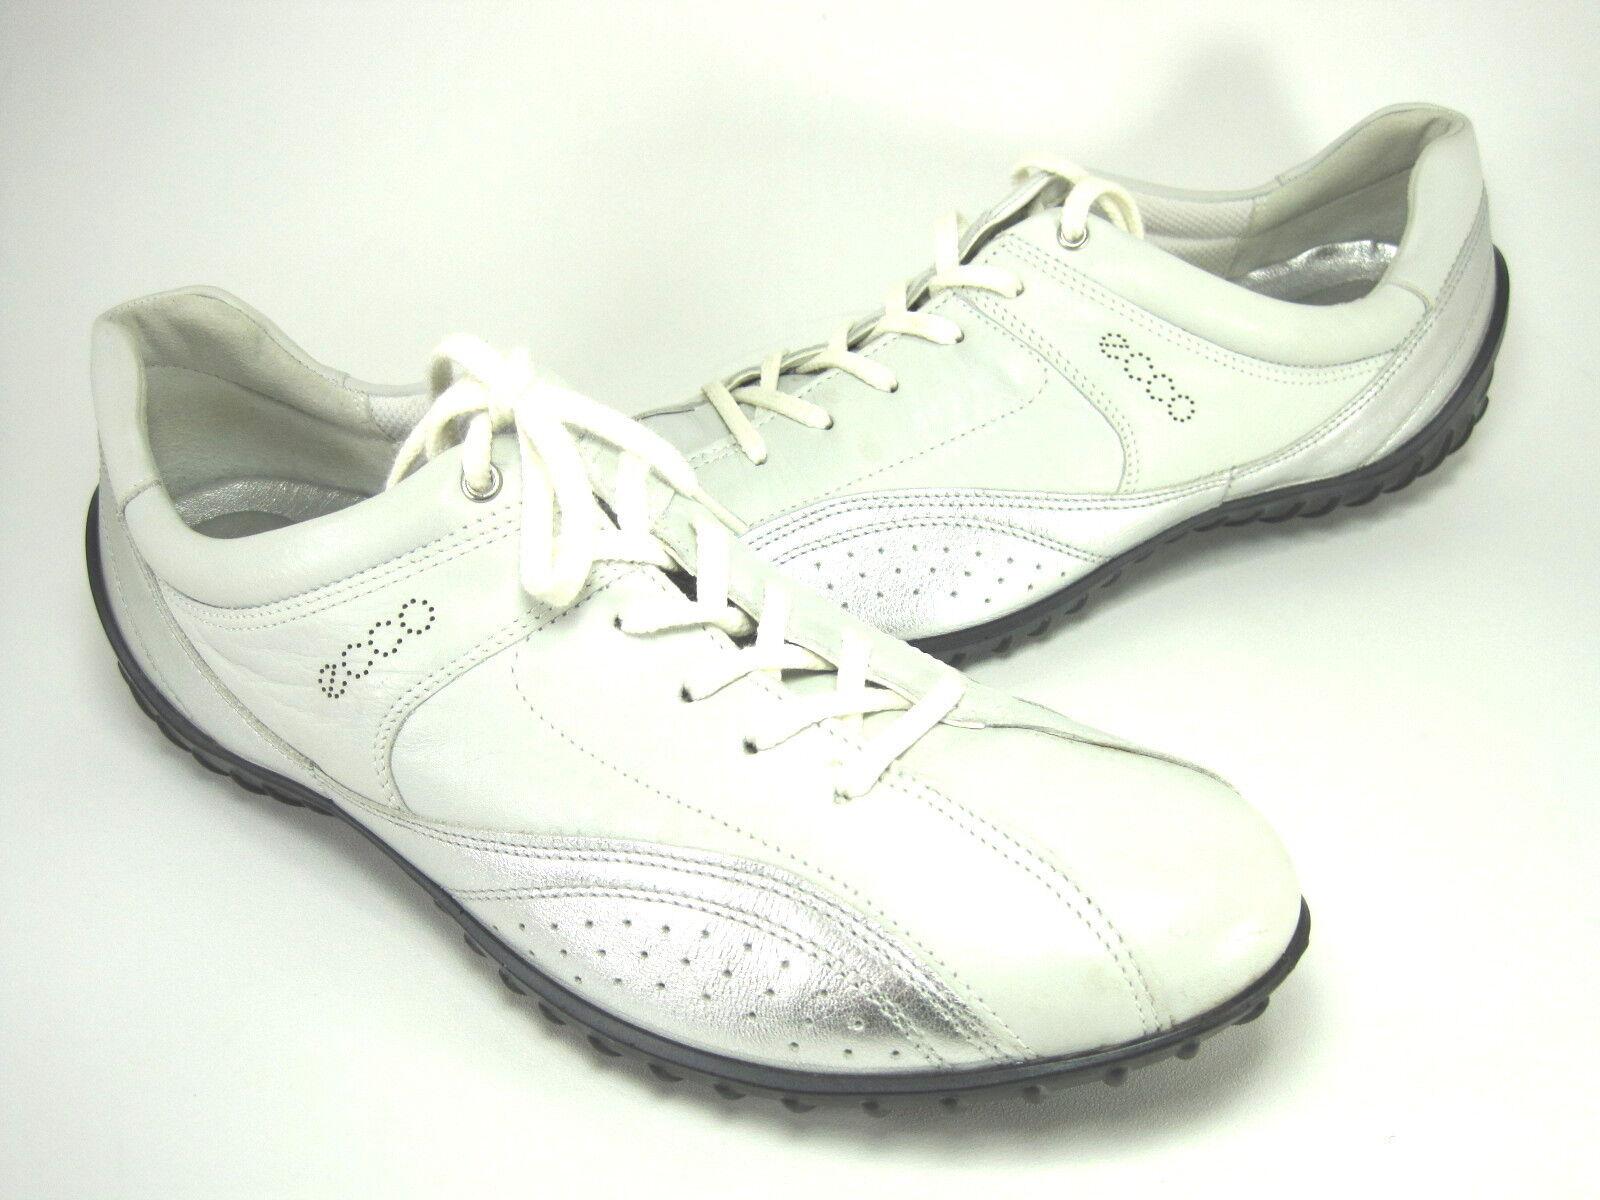 ECCO WMN'S WMN'S WMN'S CHARM TIE WALKING Turnschuhe Weiß Silber LEATHER EUR SZ 43 US 12-12.5 M 706ec6